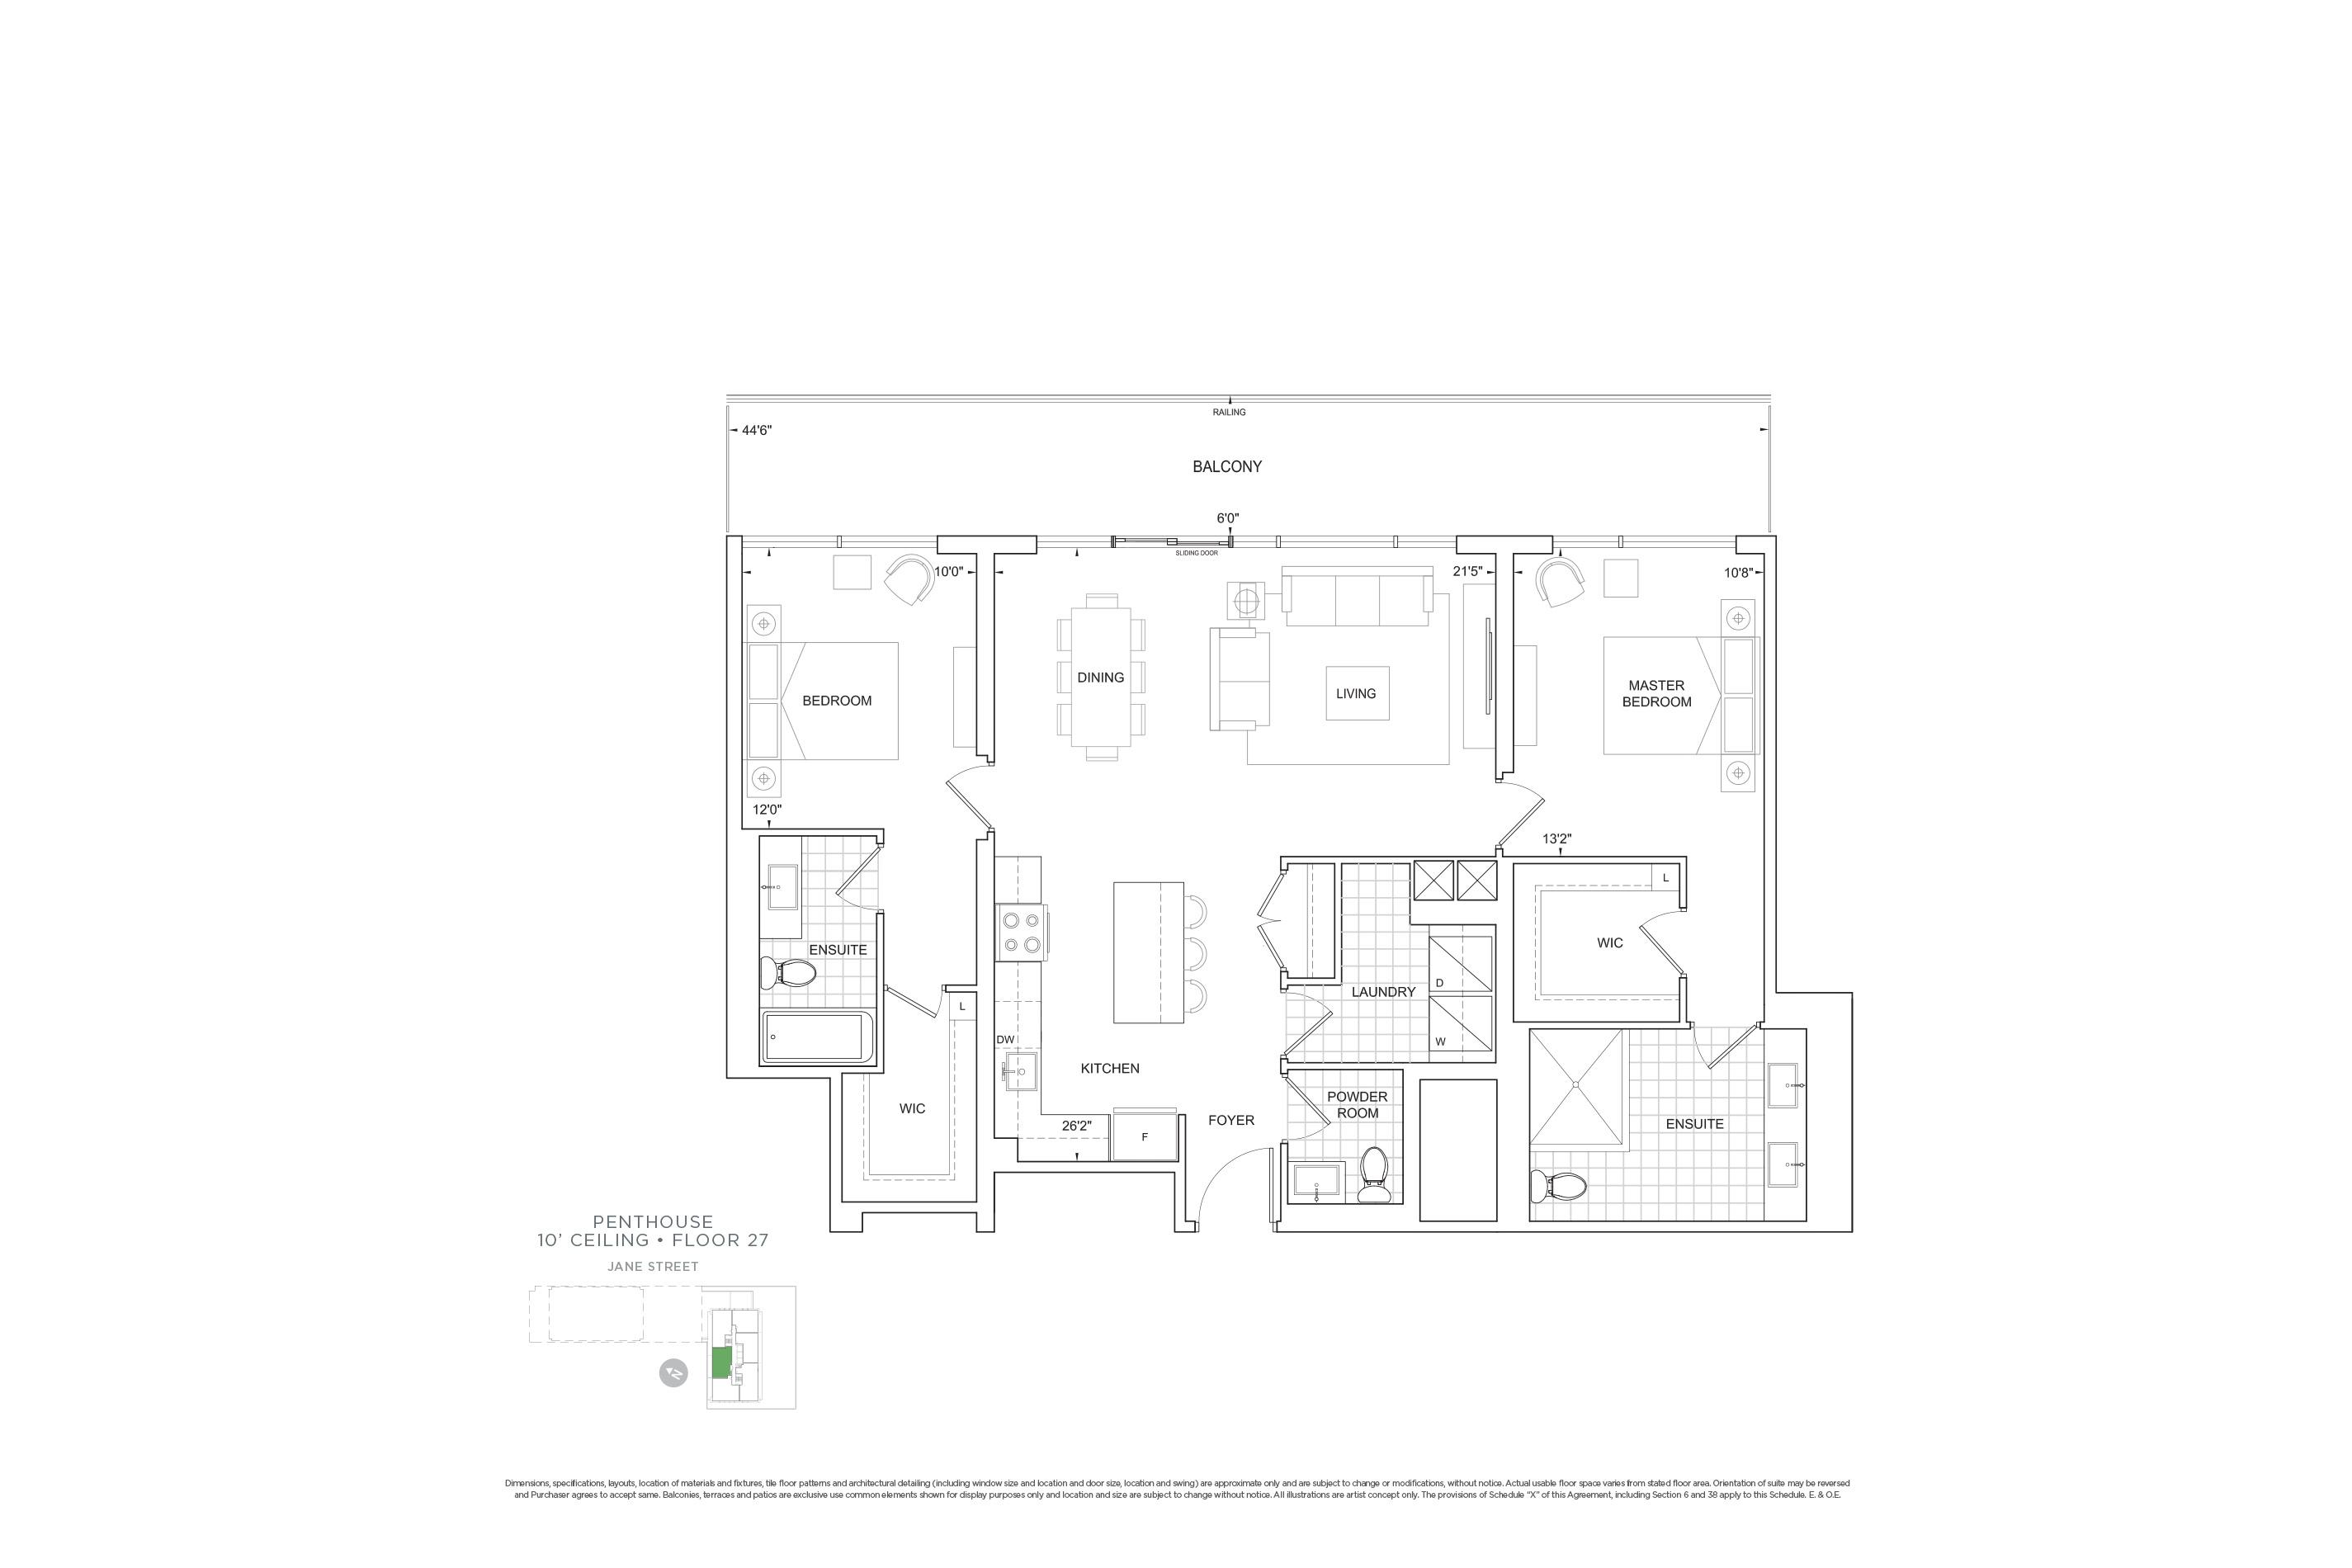 C1288 Penthouse Units